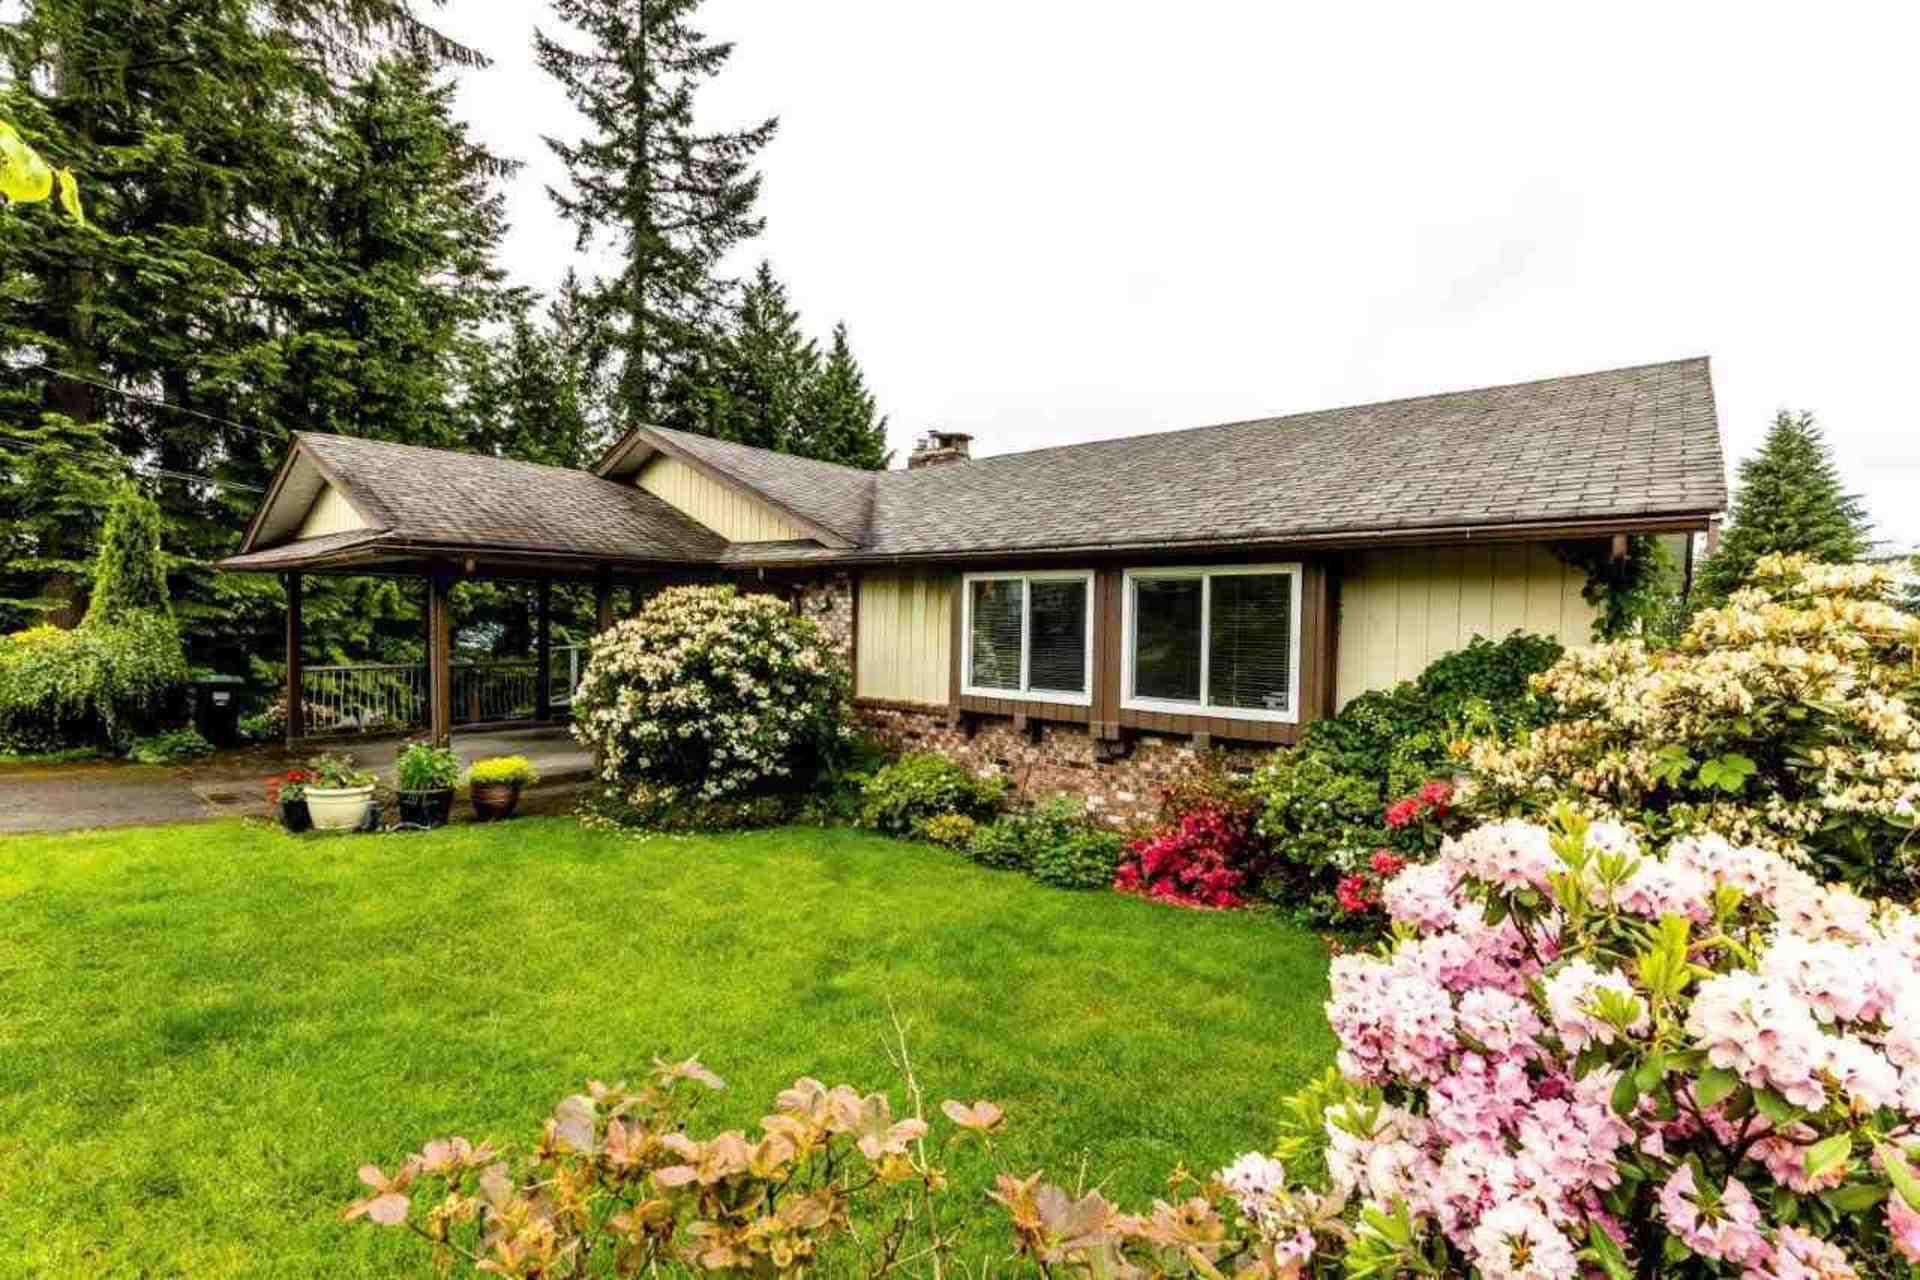 3863-st-pauls-avenue-upper-lonsdale-north-vancouver-02 at 3863 St. Pauls Avenue, Upper Lonsdale, North Vancouver